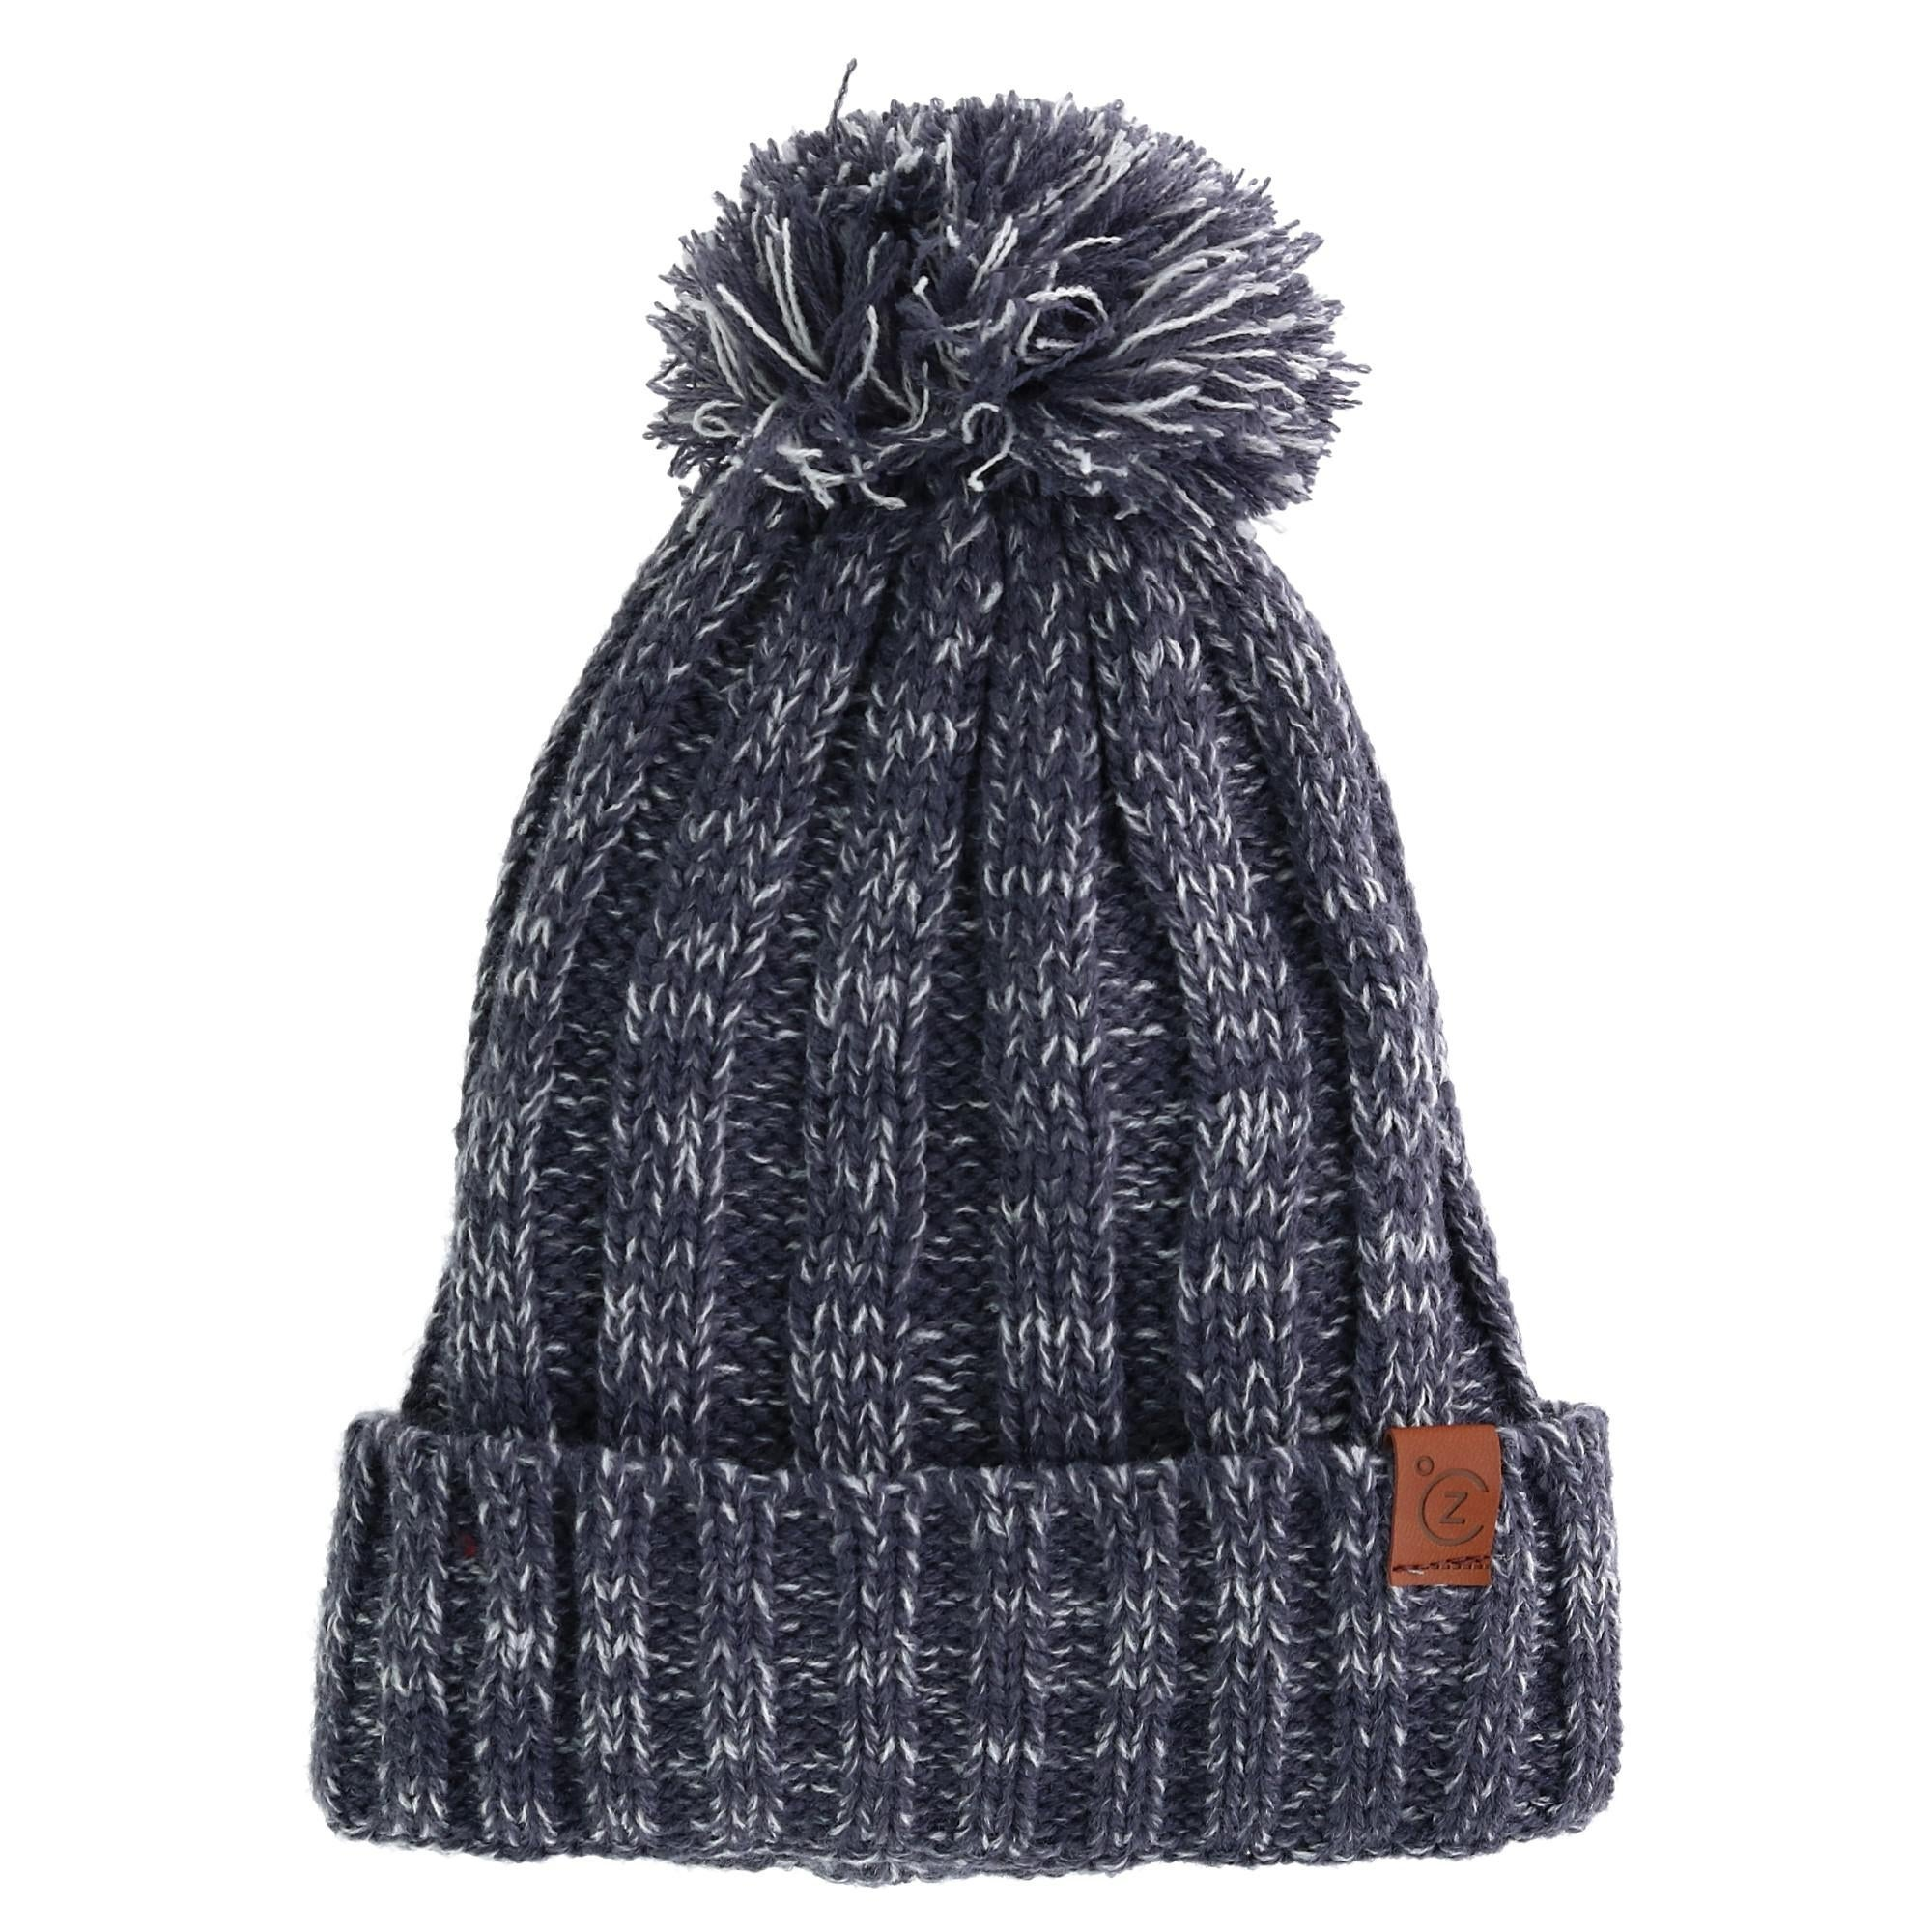 Shop ClimaZer0 Marled Knit Cuff Cap with Full Sherpa Lining - Free ... c56da32d635